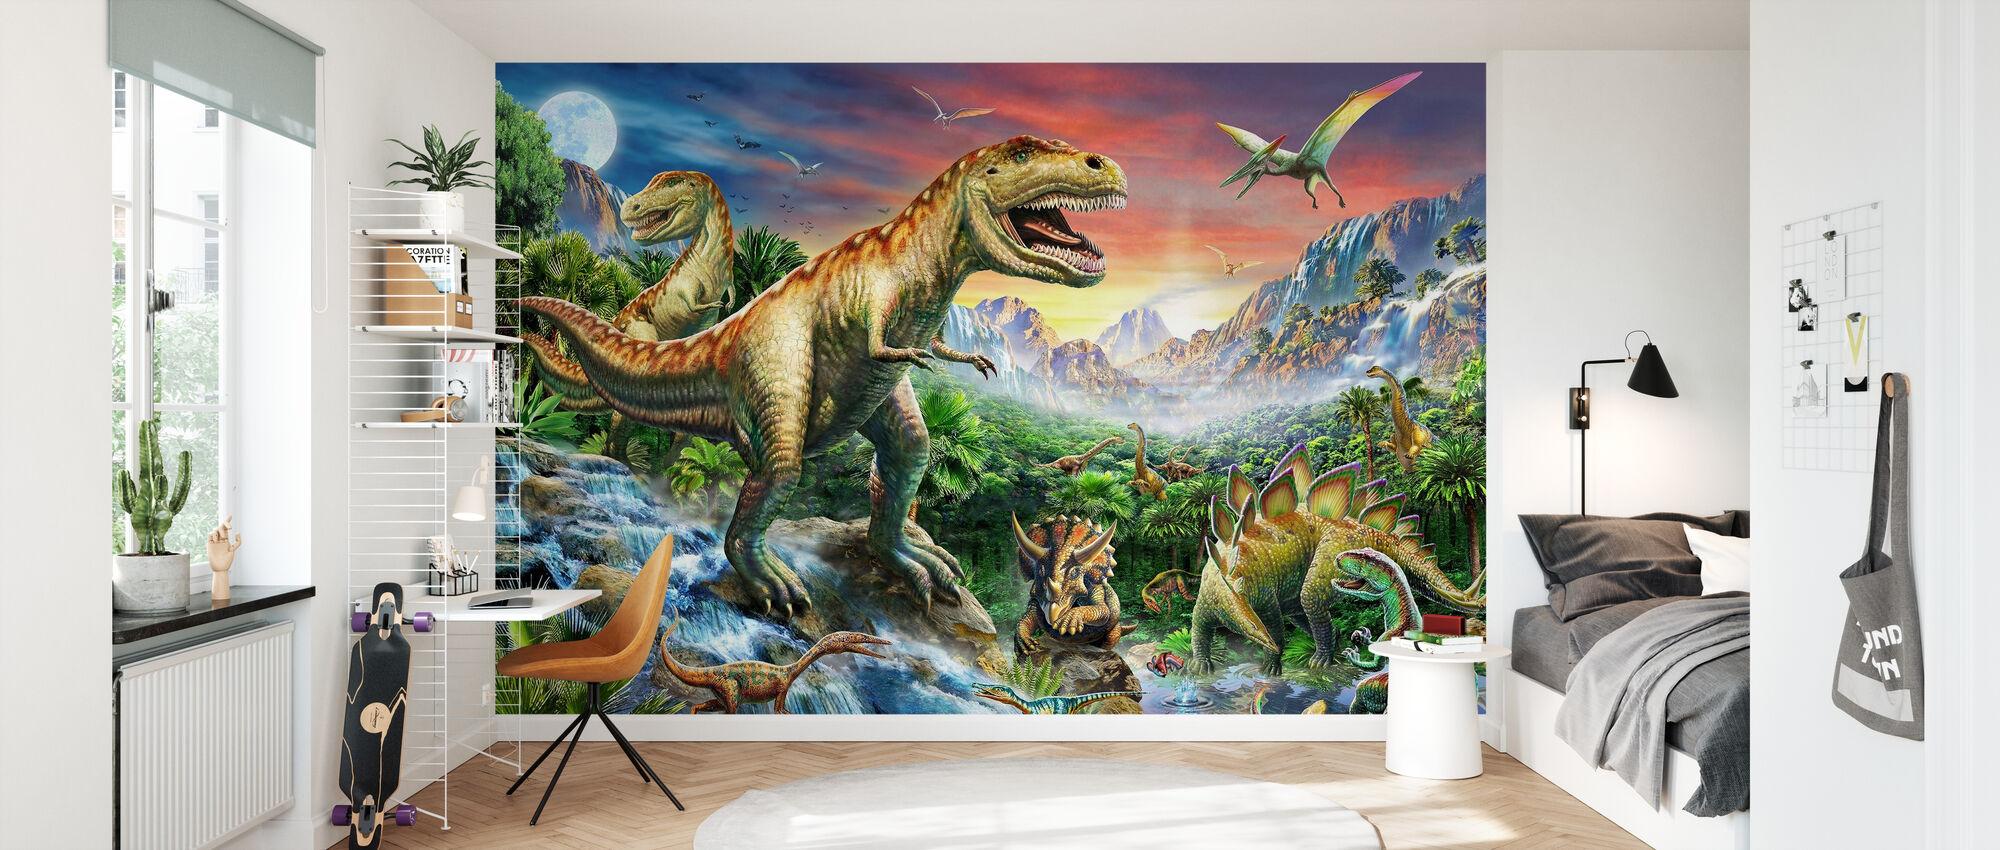 Jurassic Landscape - Wallpaper - Kids Room